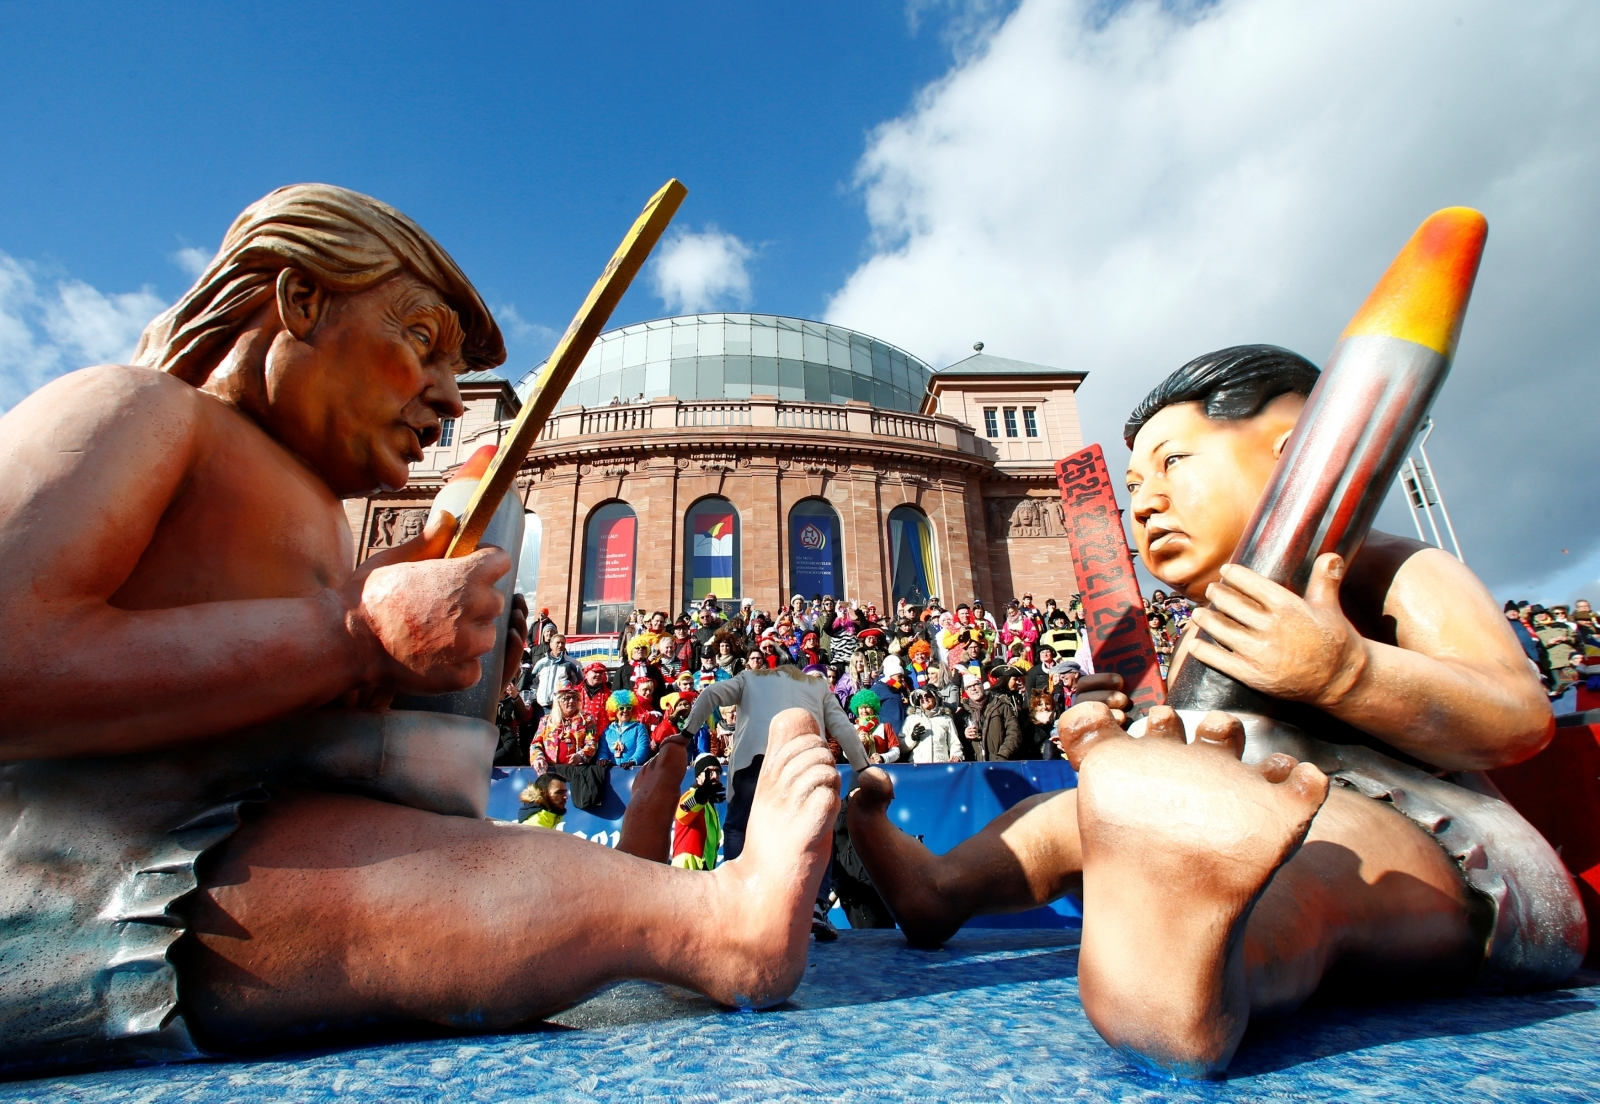 Bildergebnis für Trump and the Russian bear German Carnival Parade